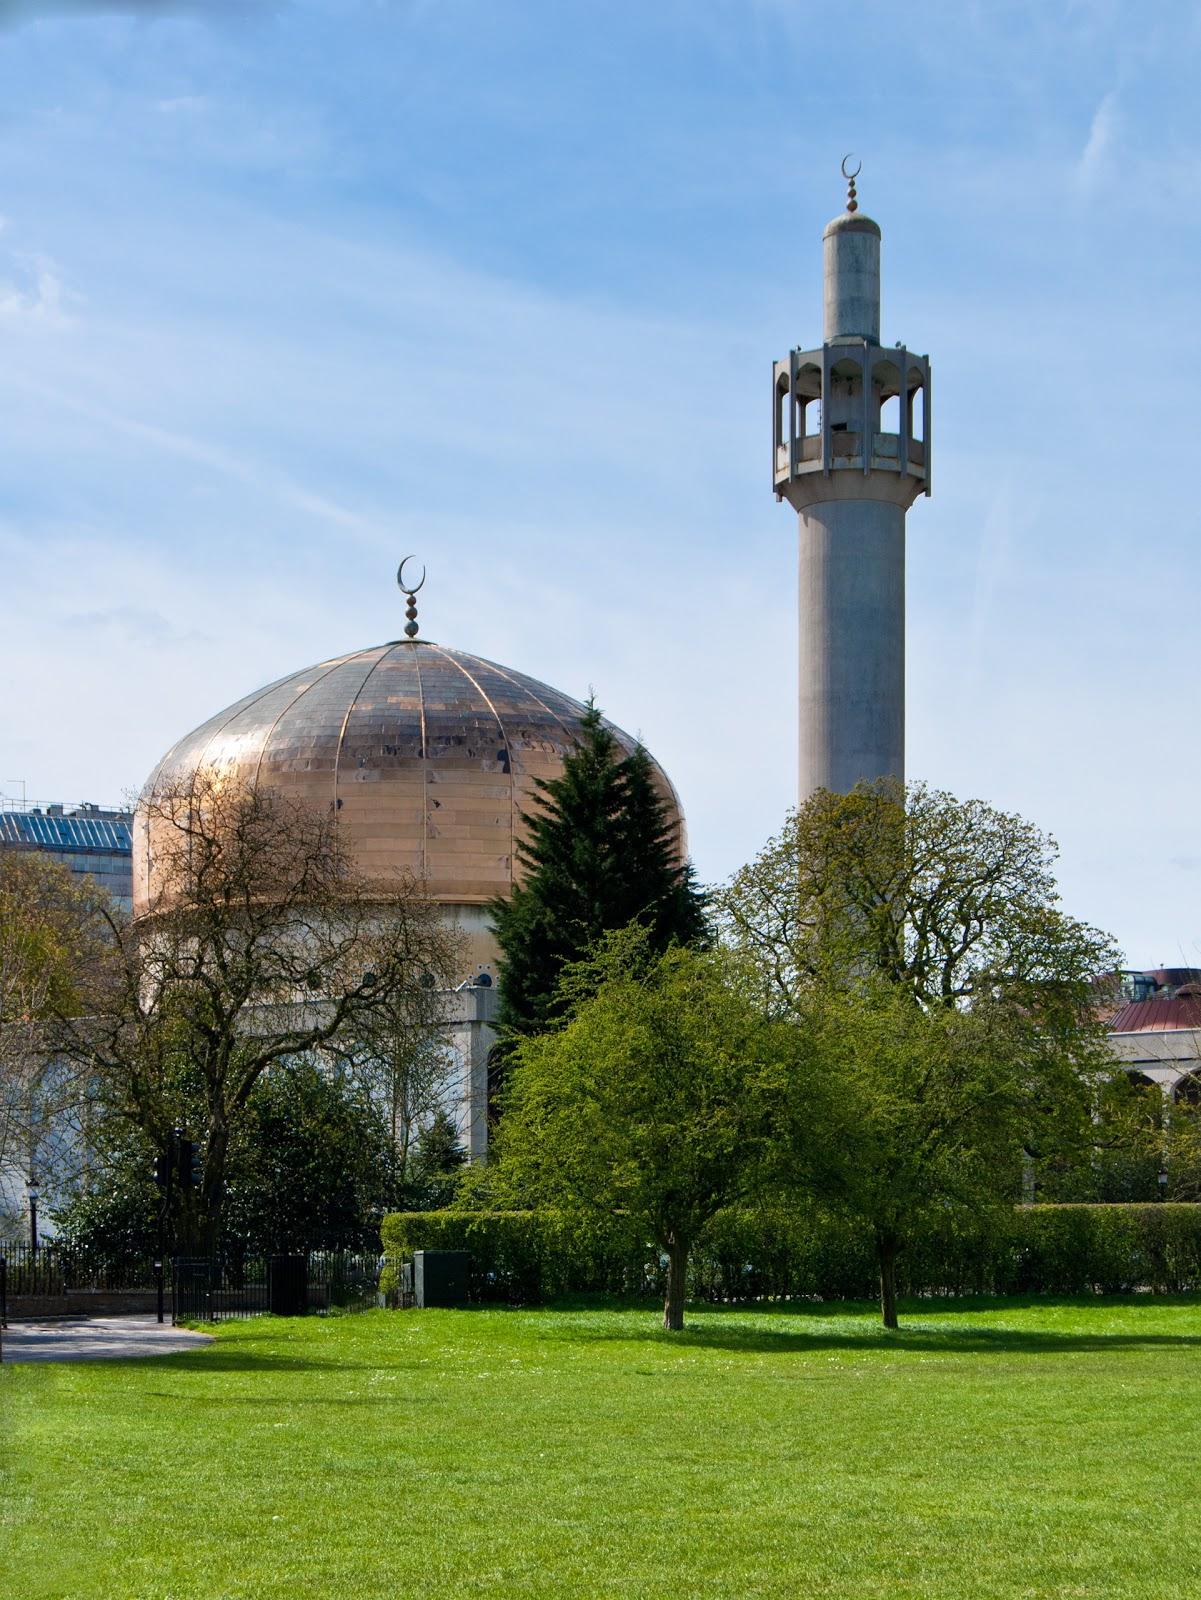 Rindu Masjid Masjid Sentral London London Central Mosque Inggris